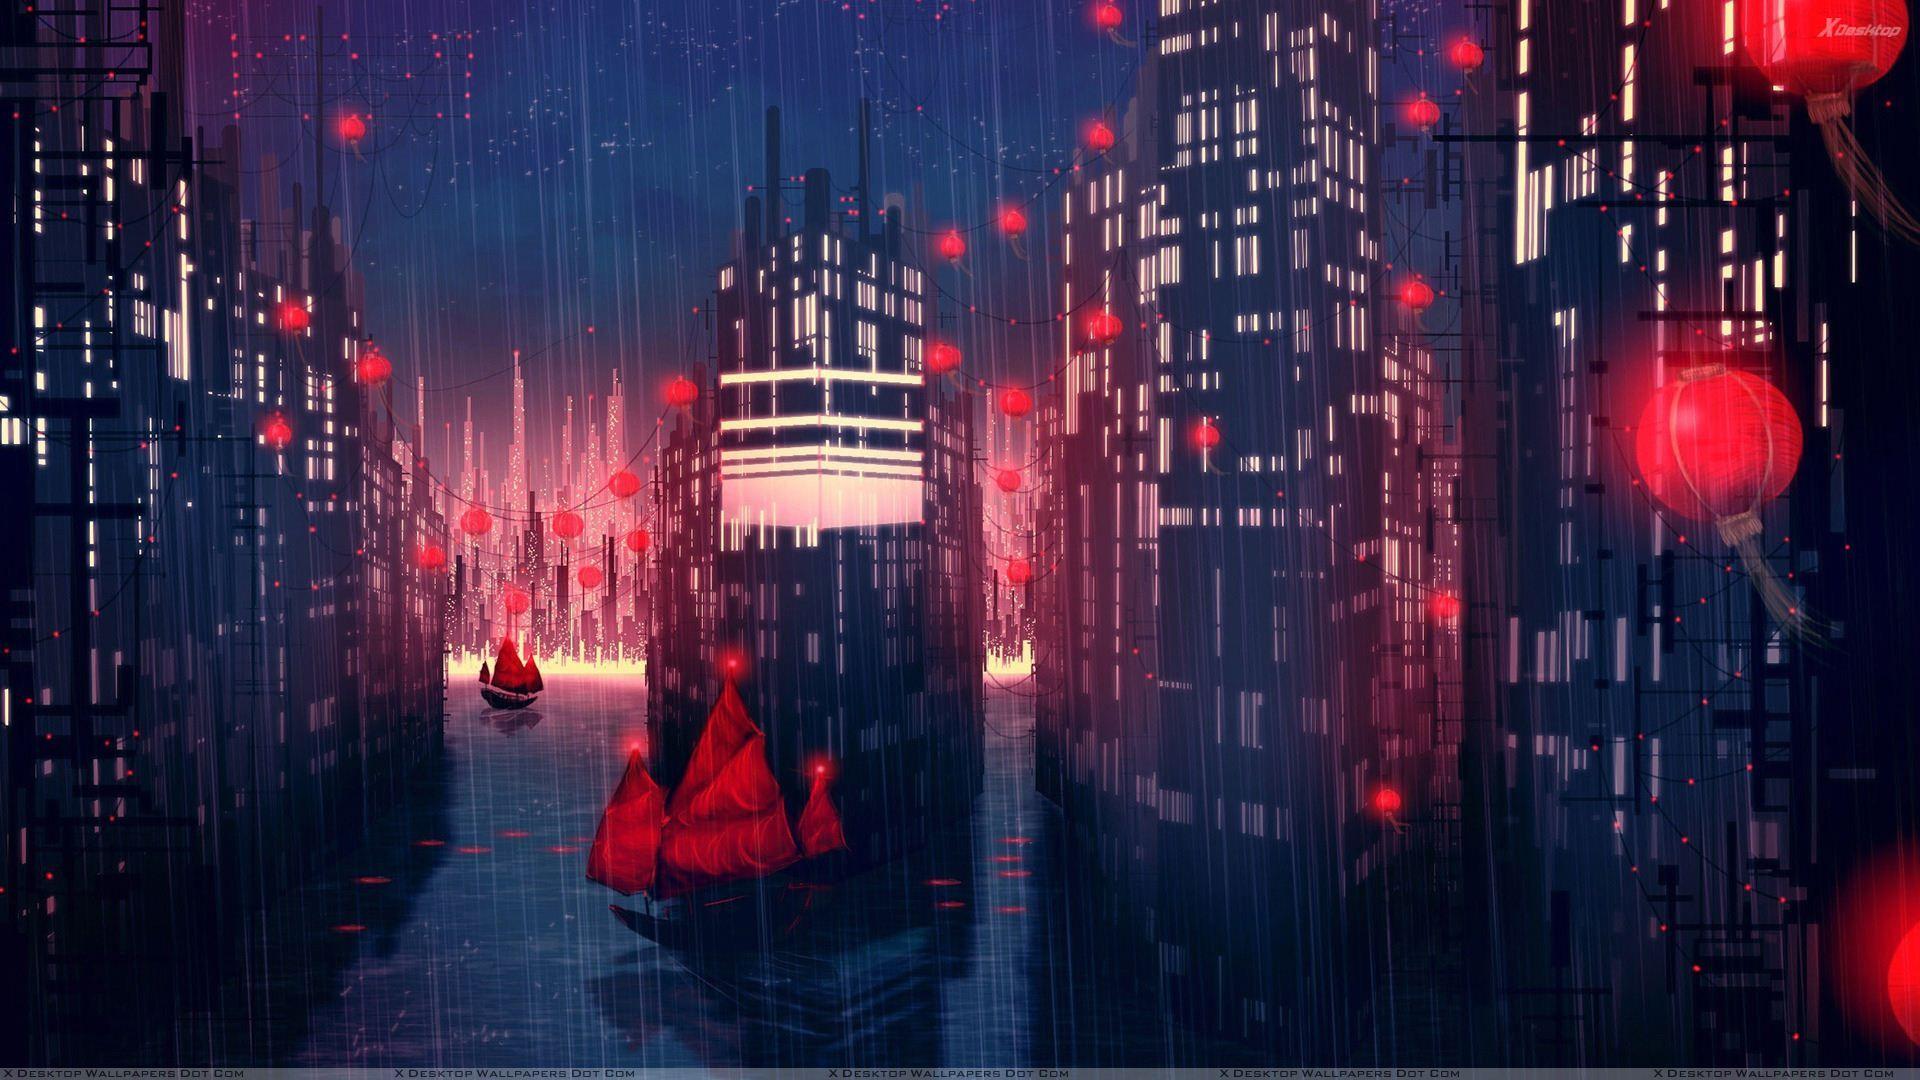 Rainy Red City Night Scene Jpg 1920 1080 Anime Scenery Wallpaper Anime Scenery Cityscape Wallpaper